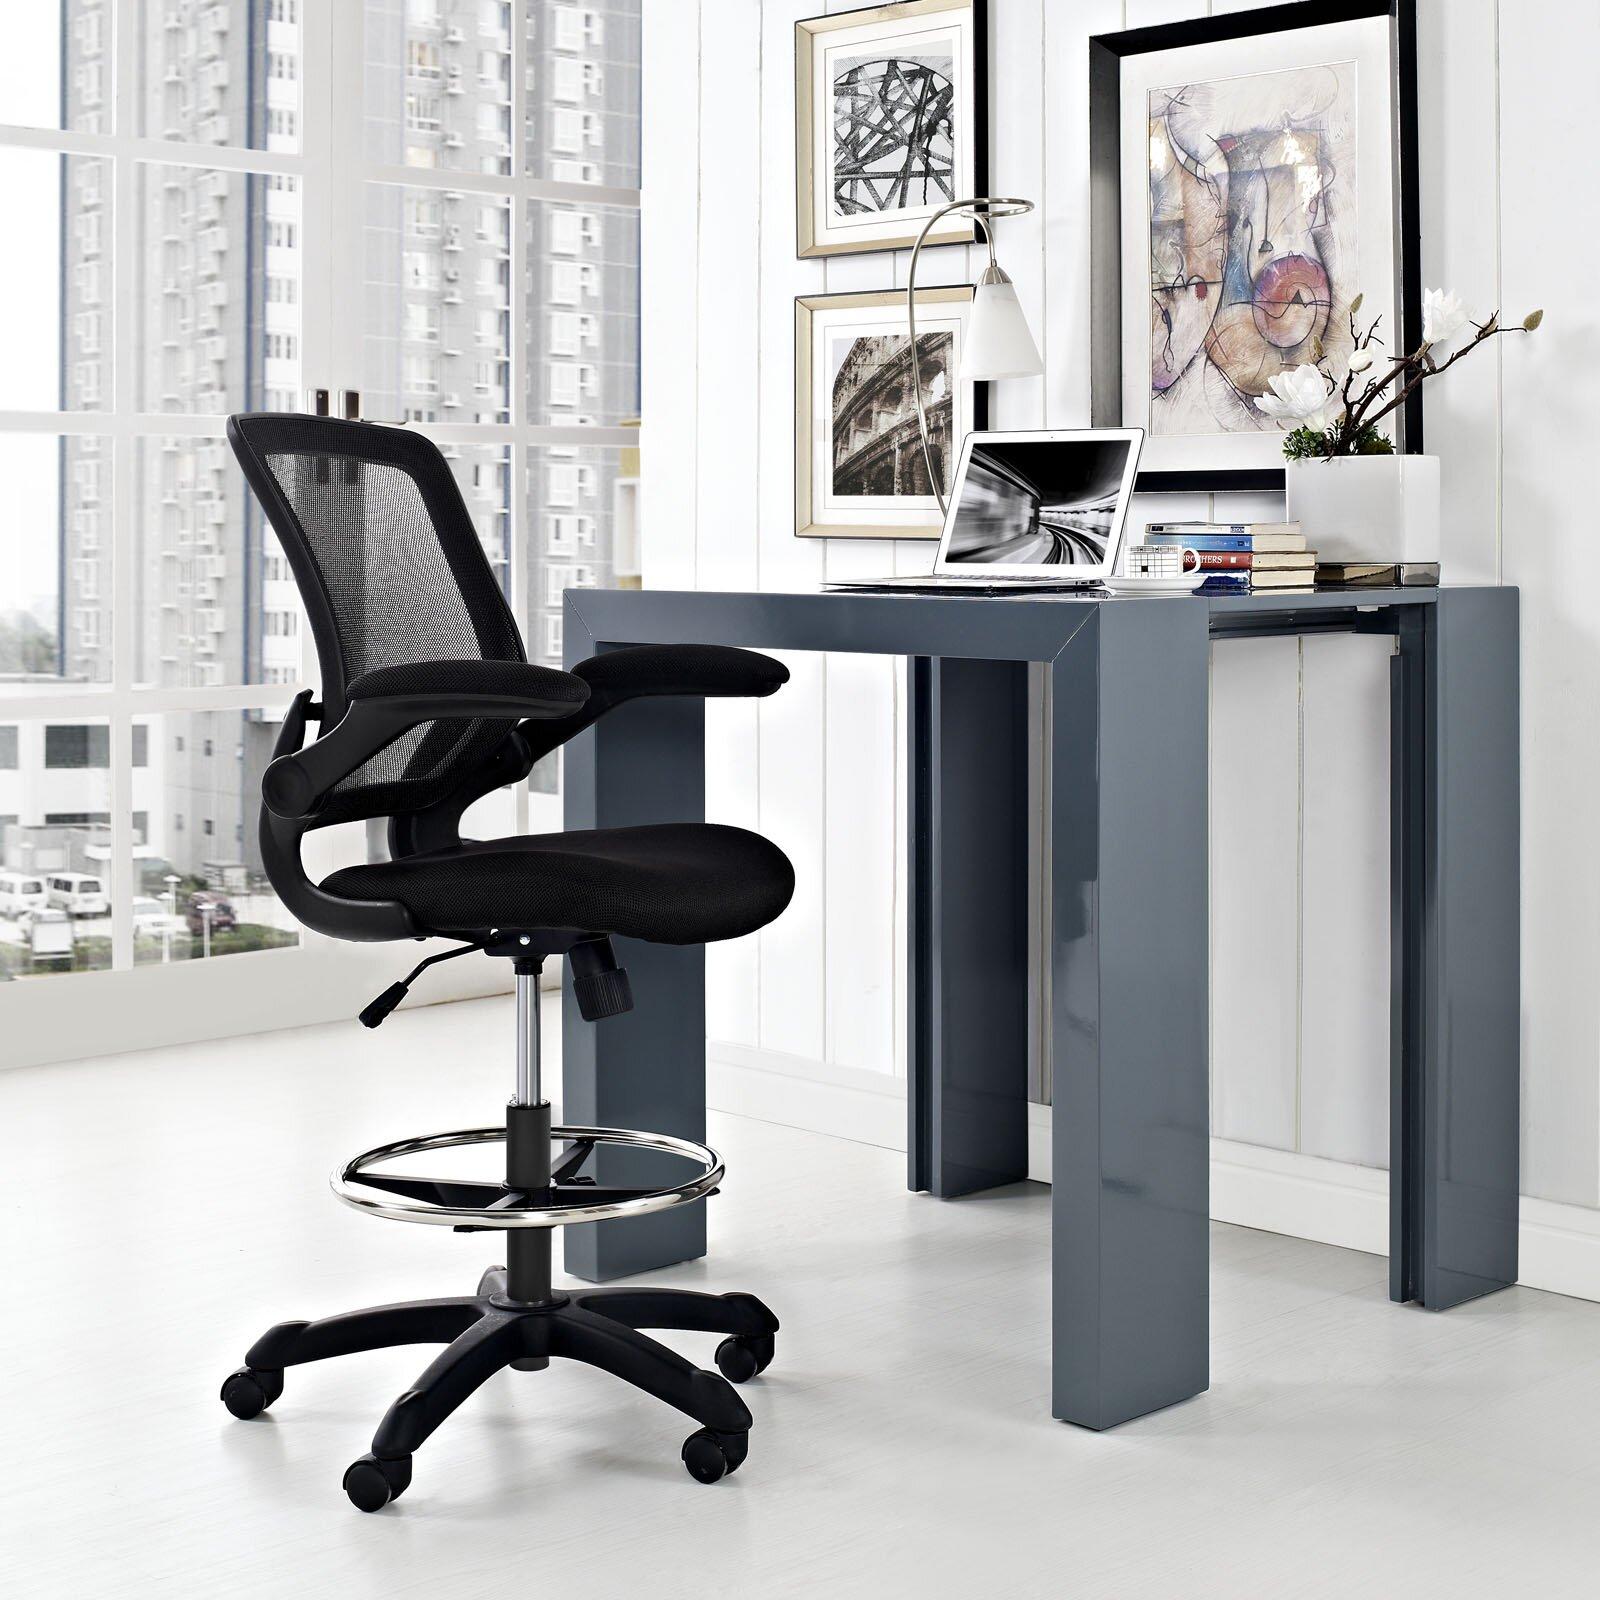 Zipcode Design Gail HighBack Mesh Drafting Chair Reviews – High Drafting Chair